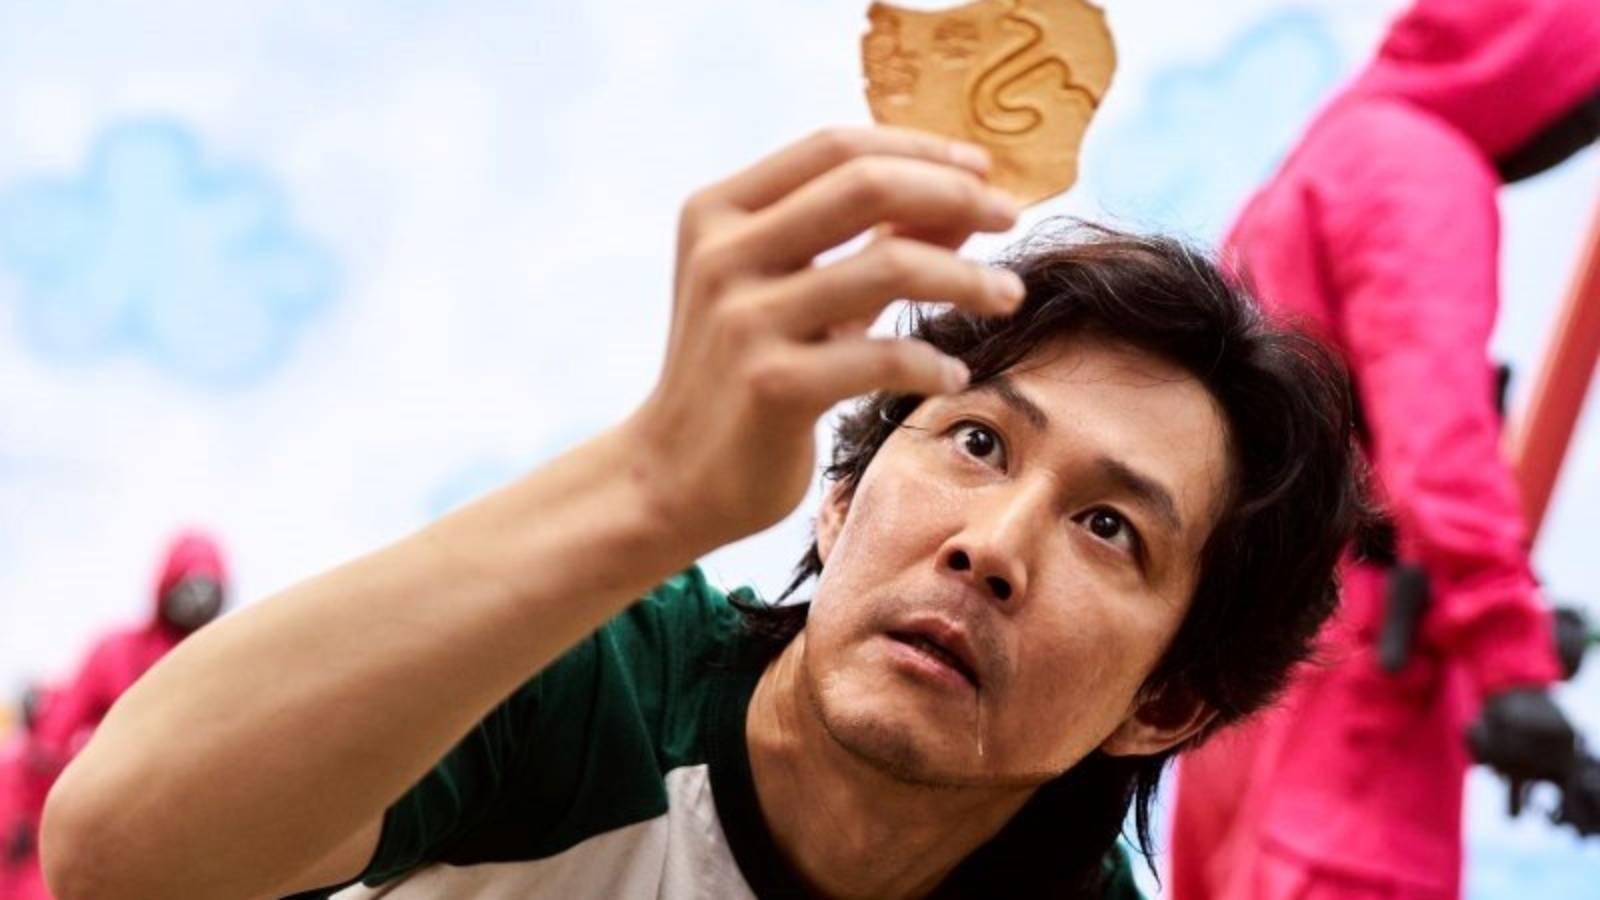 Hyper-violent Korean series Netflix's biggest hit